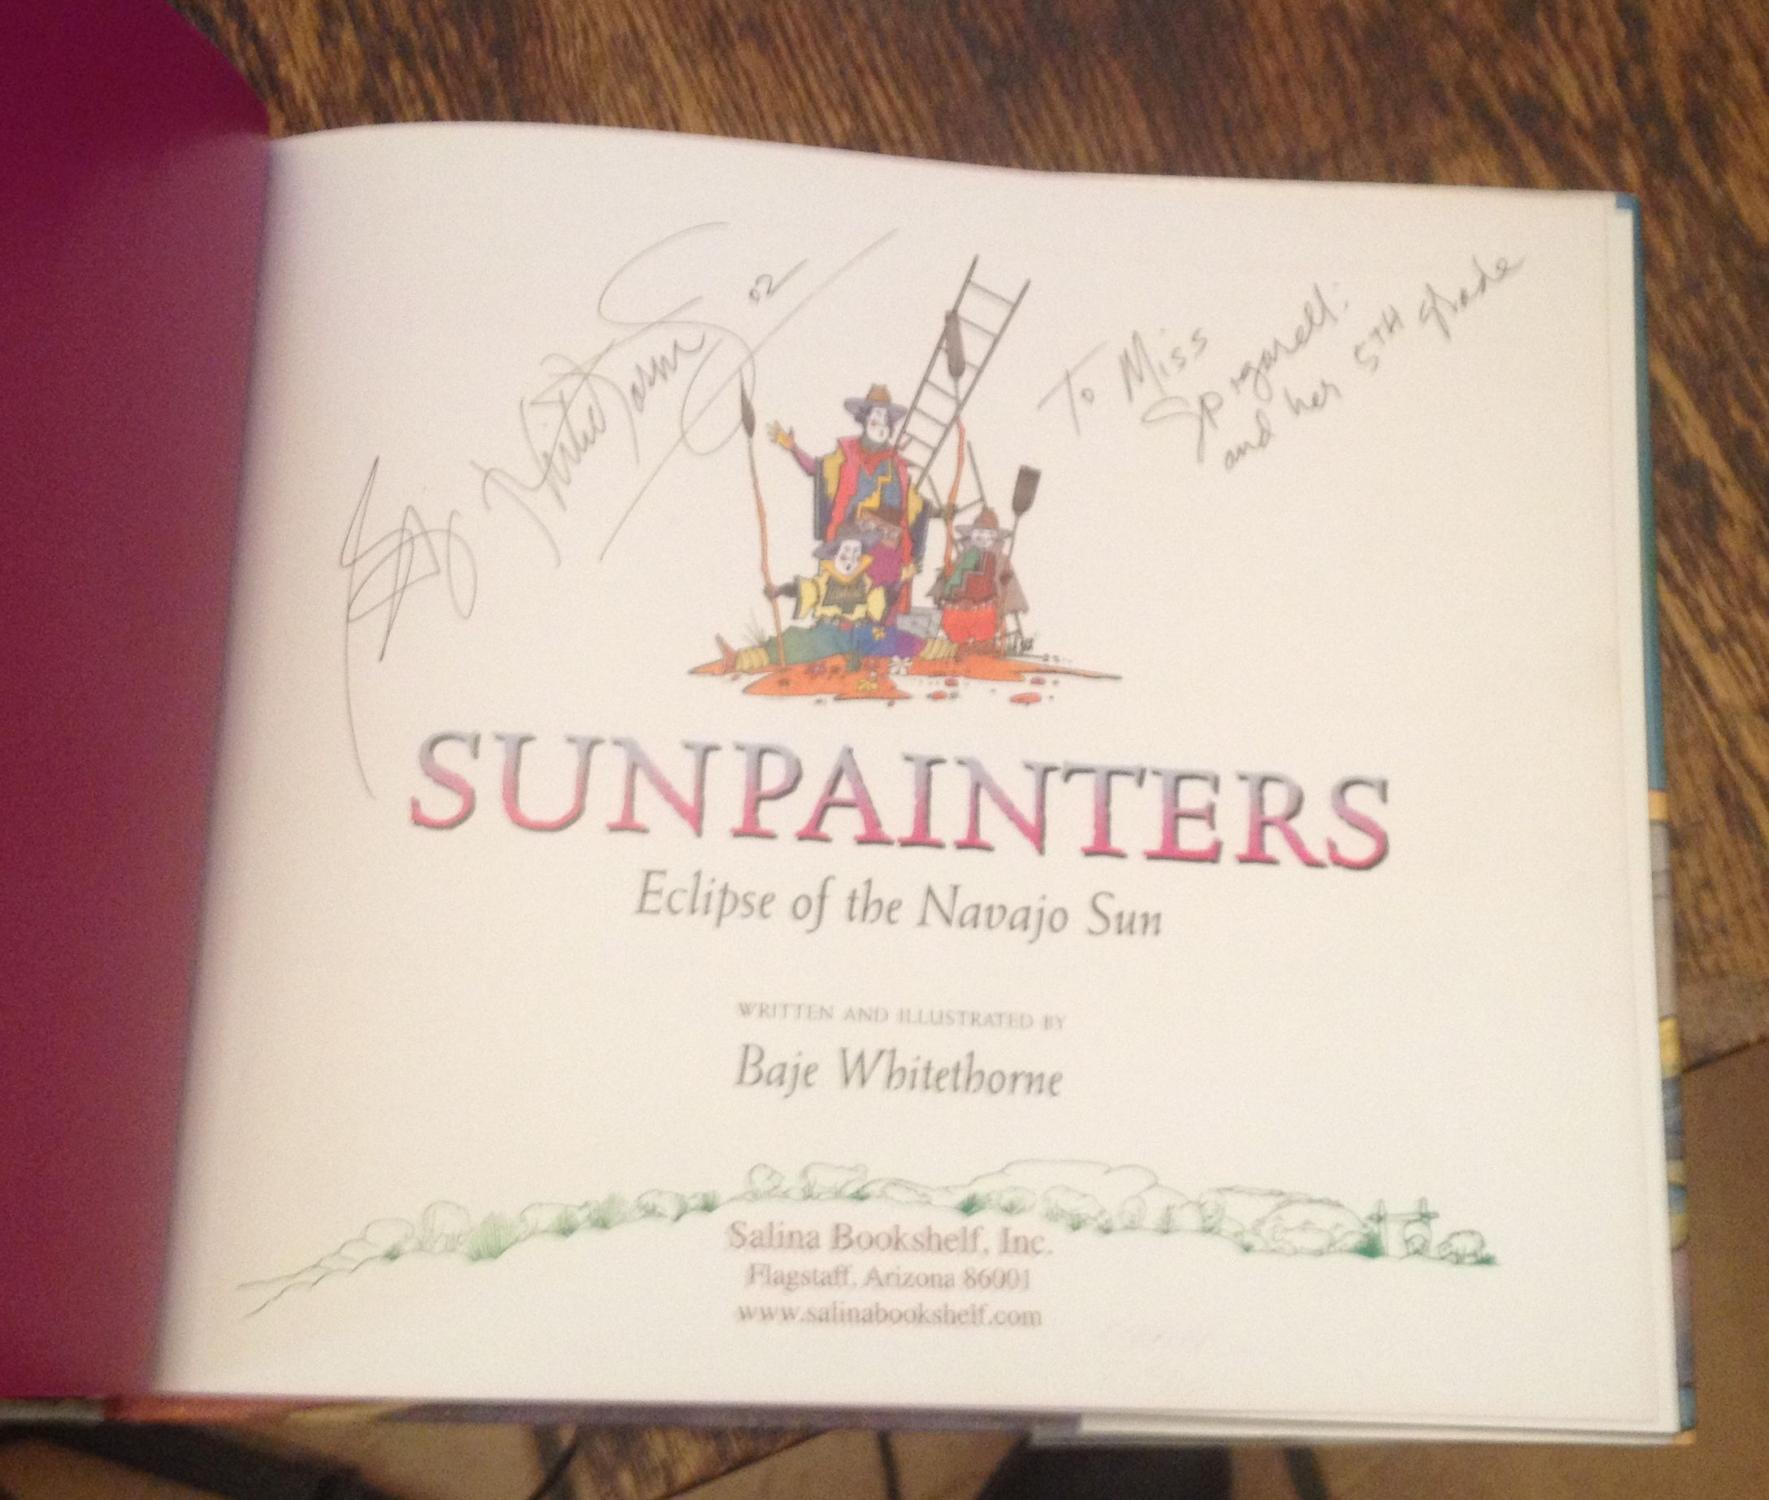 Sunpainters Eclipse Of The Navajo Sun By Whitethorne Baje Salina Bookshelf Flagstaff AZ 9781893354333 Hard Cover 1st Signed Inscribed Author